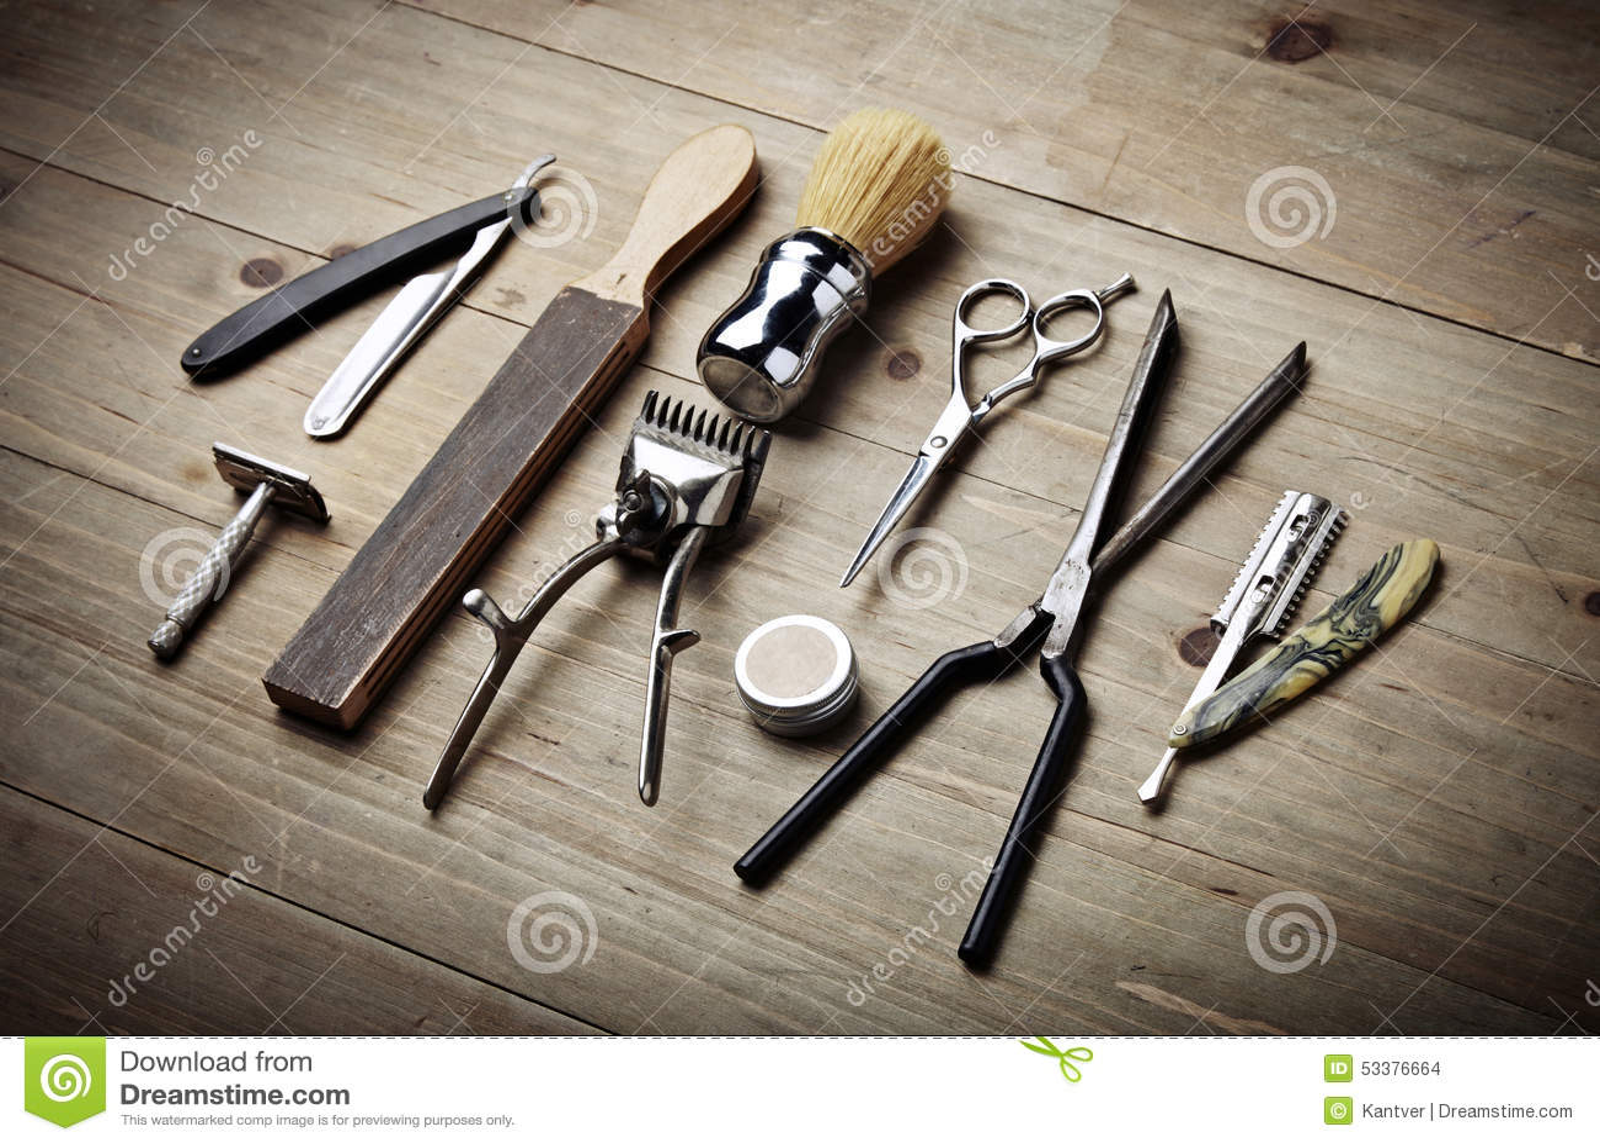 Vintage Tools Of Barber Shop On Wood Desk Stock Photo